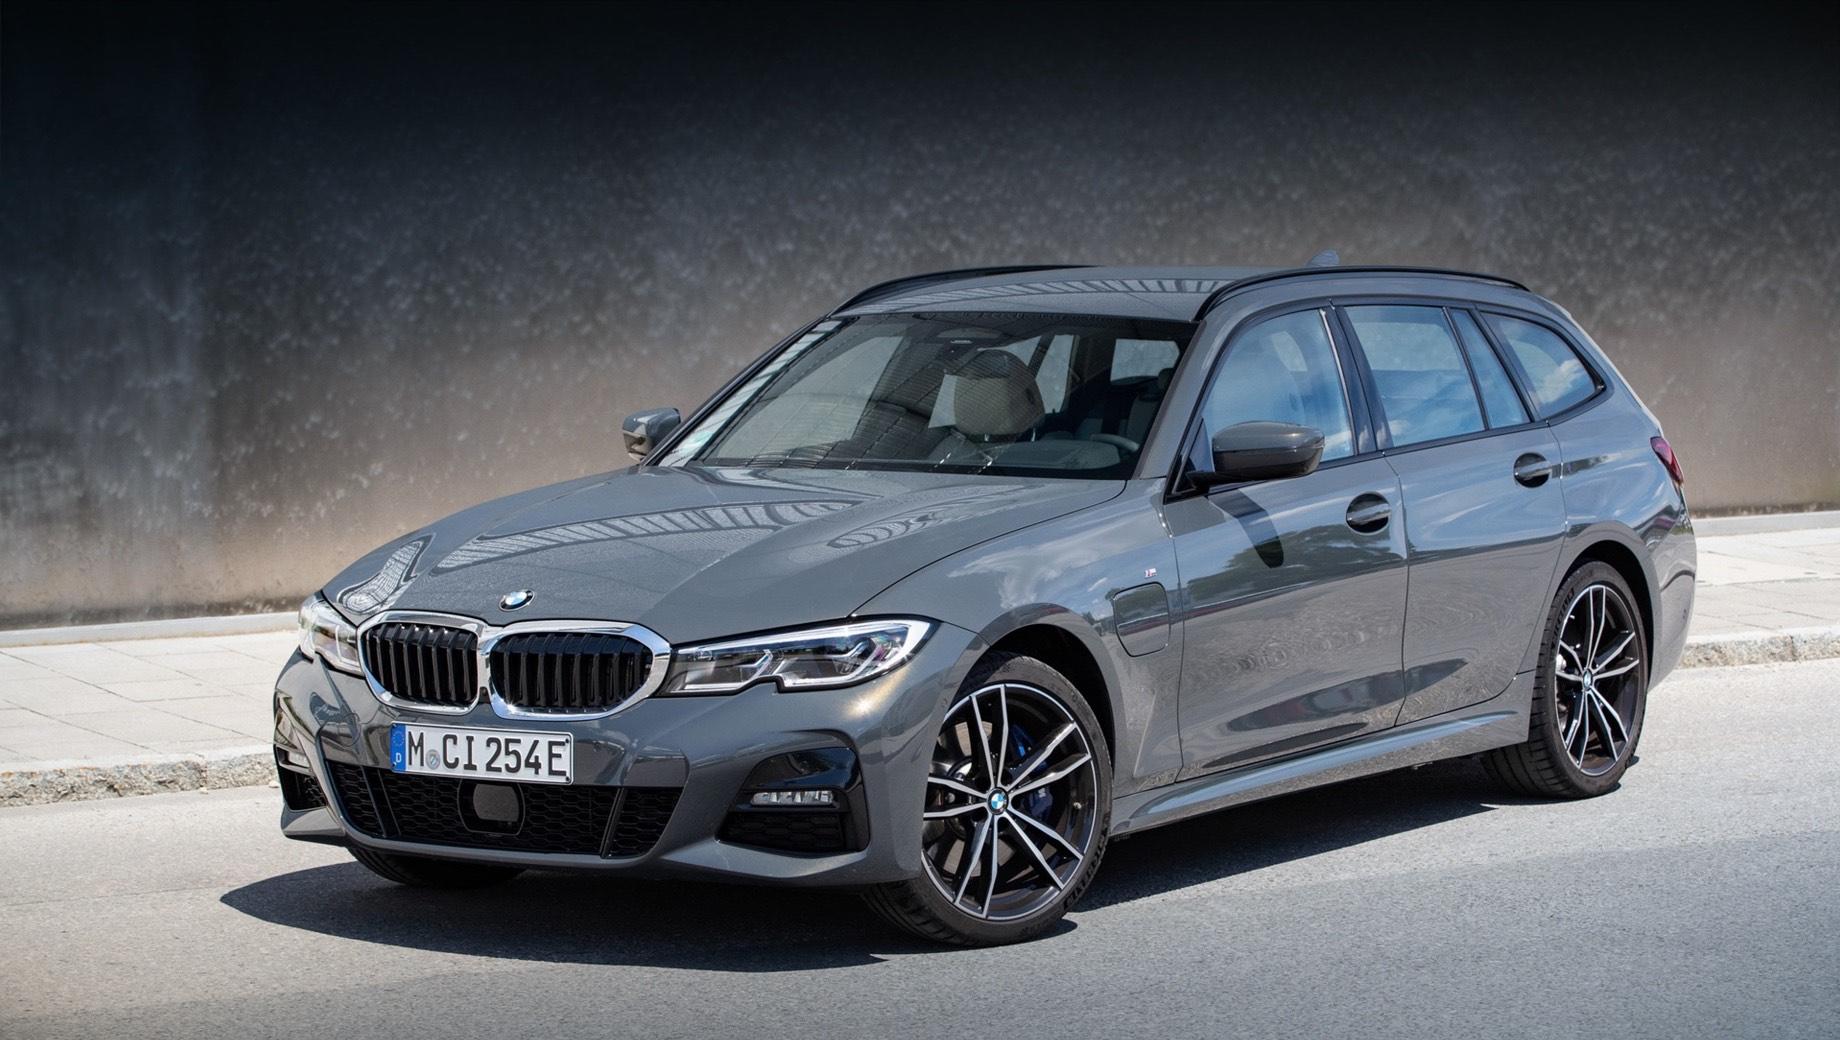 Bmw 3,Bmw 5,Bmw 3 hybrid,Bmw 5 hybrid. В Германии за BMW 320e просят 47 450 евро (4,3 млн рублей), за универсал с задним приводом — 49 000 (4,5 млн), а за 320e Touring xDrive — 51 500 евро (4,7 млн). При этом правительство компенсирует покупателям до 6750 евро (618 тысяч). В России продажи BMW 320e и 520e не планируются.